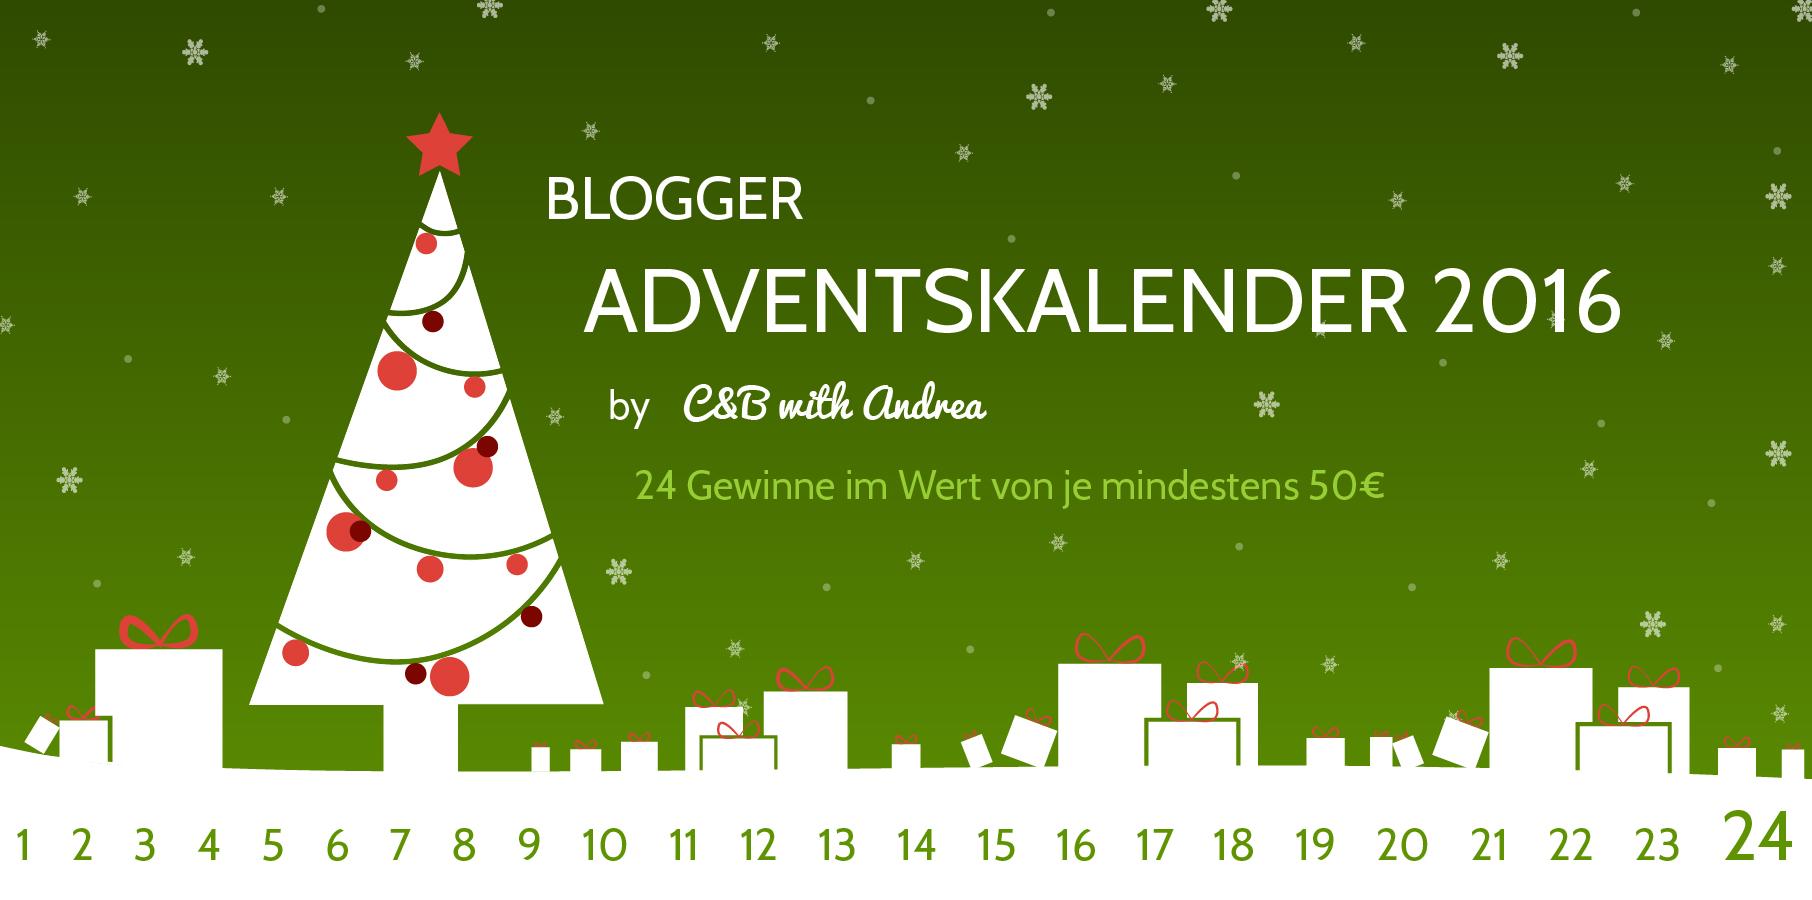 Blogger-Adventskalender - Gewinnspiel - C&B with Andrea